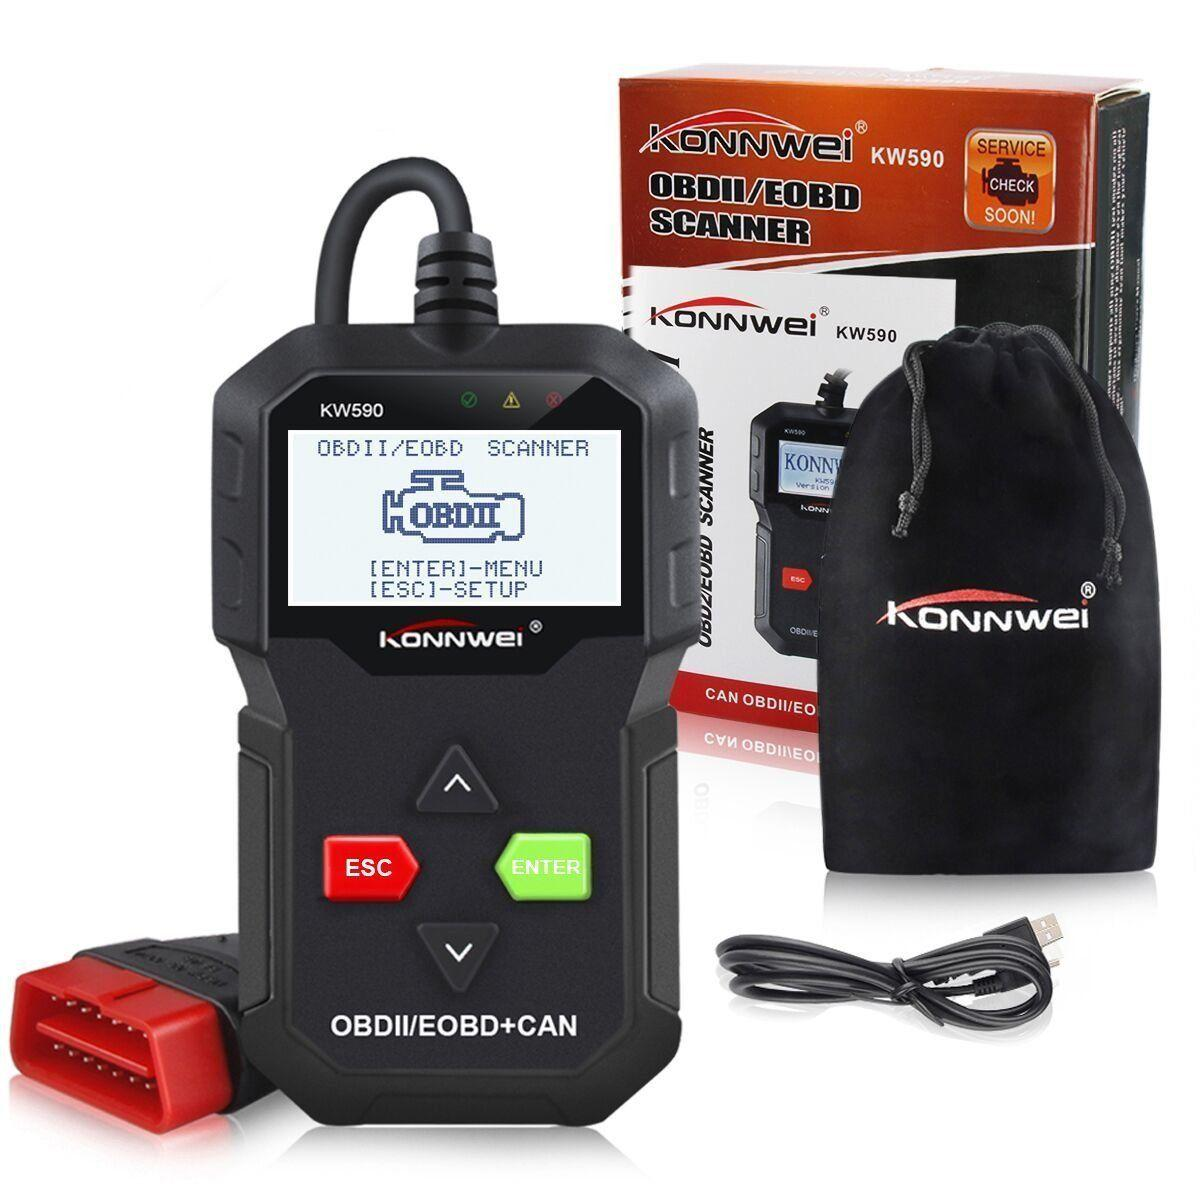 2019 KONNWEI KW590 OBD2 Automotive Scanner OBD ODB2 Car Diagnostic Tool in Russian Code Reader Auto Scanner Better than AD310 ELM327